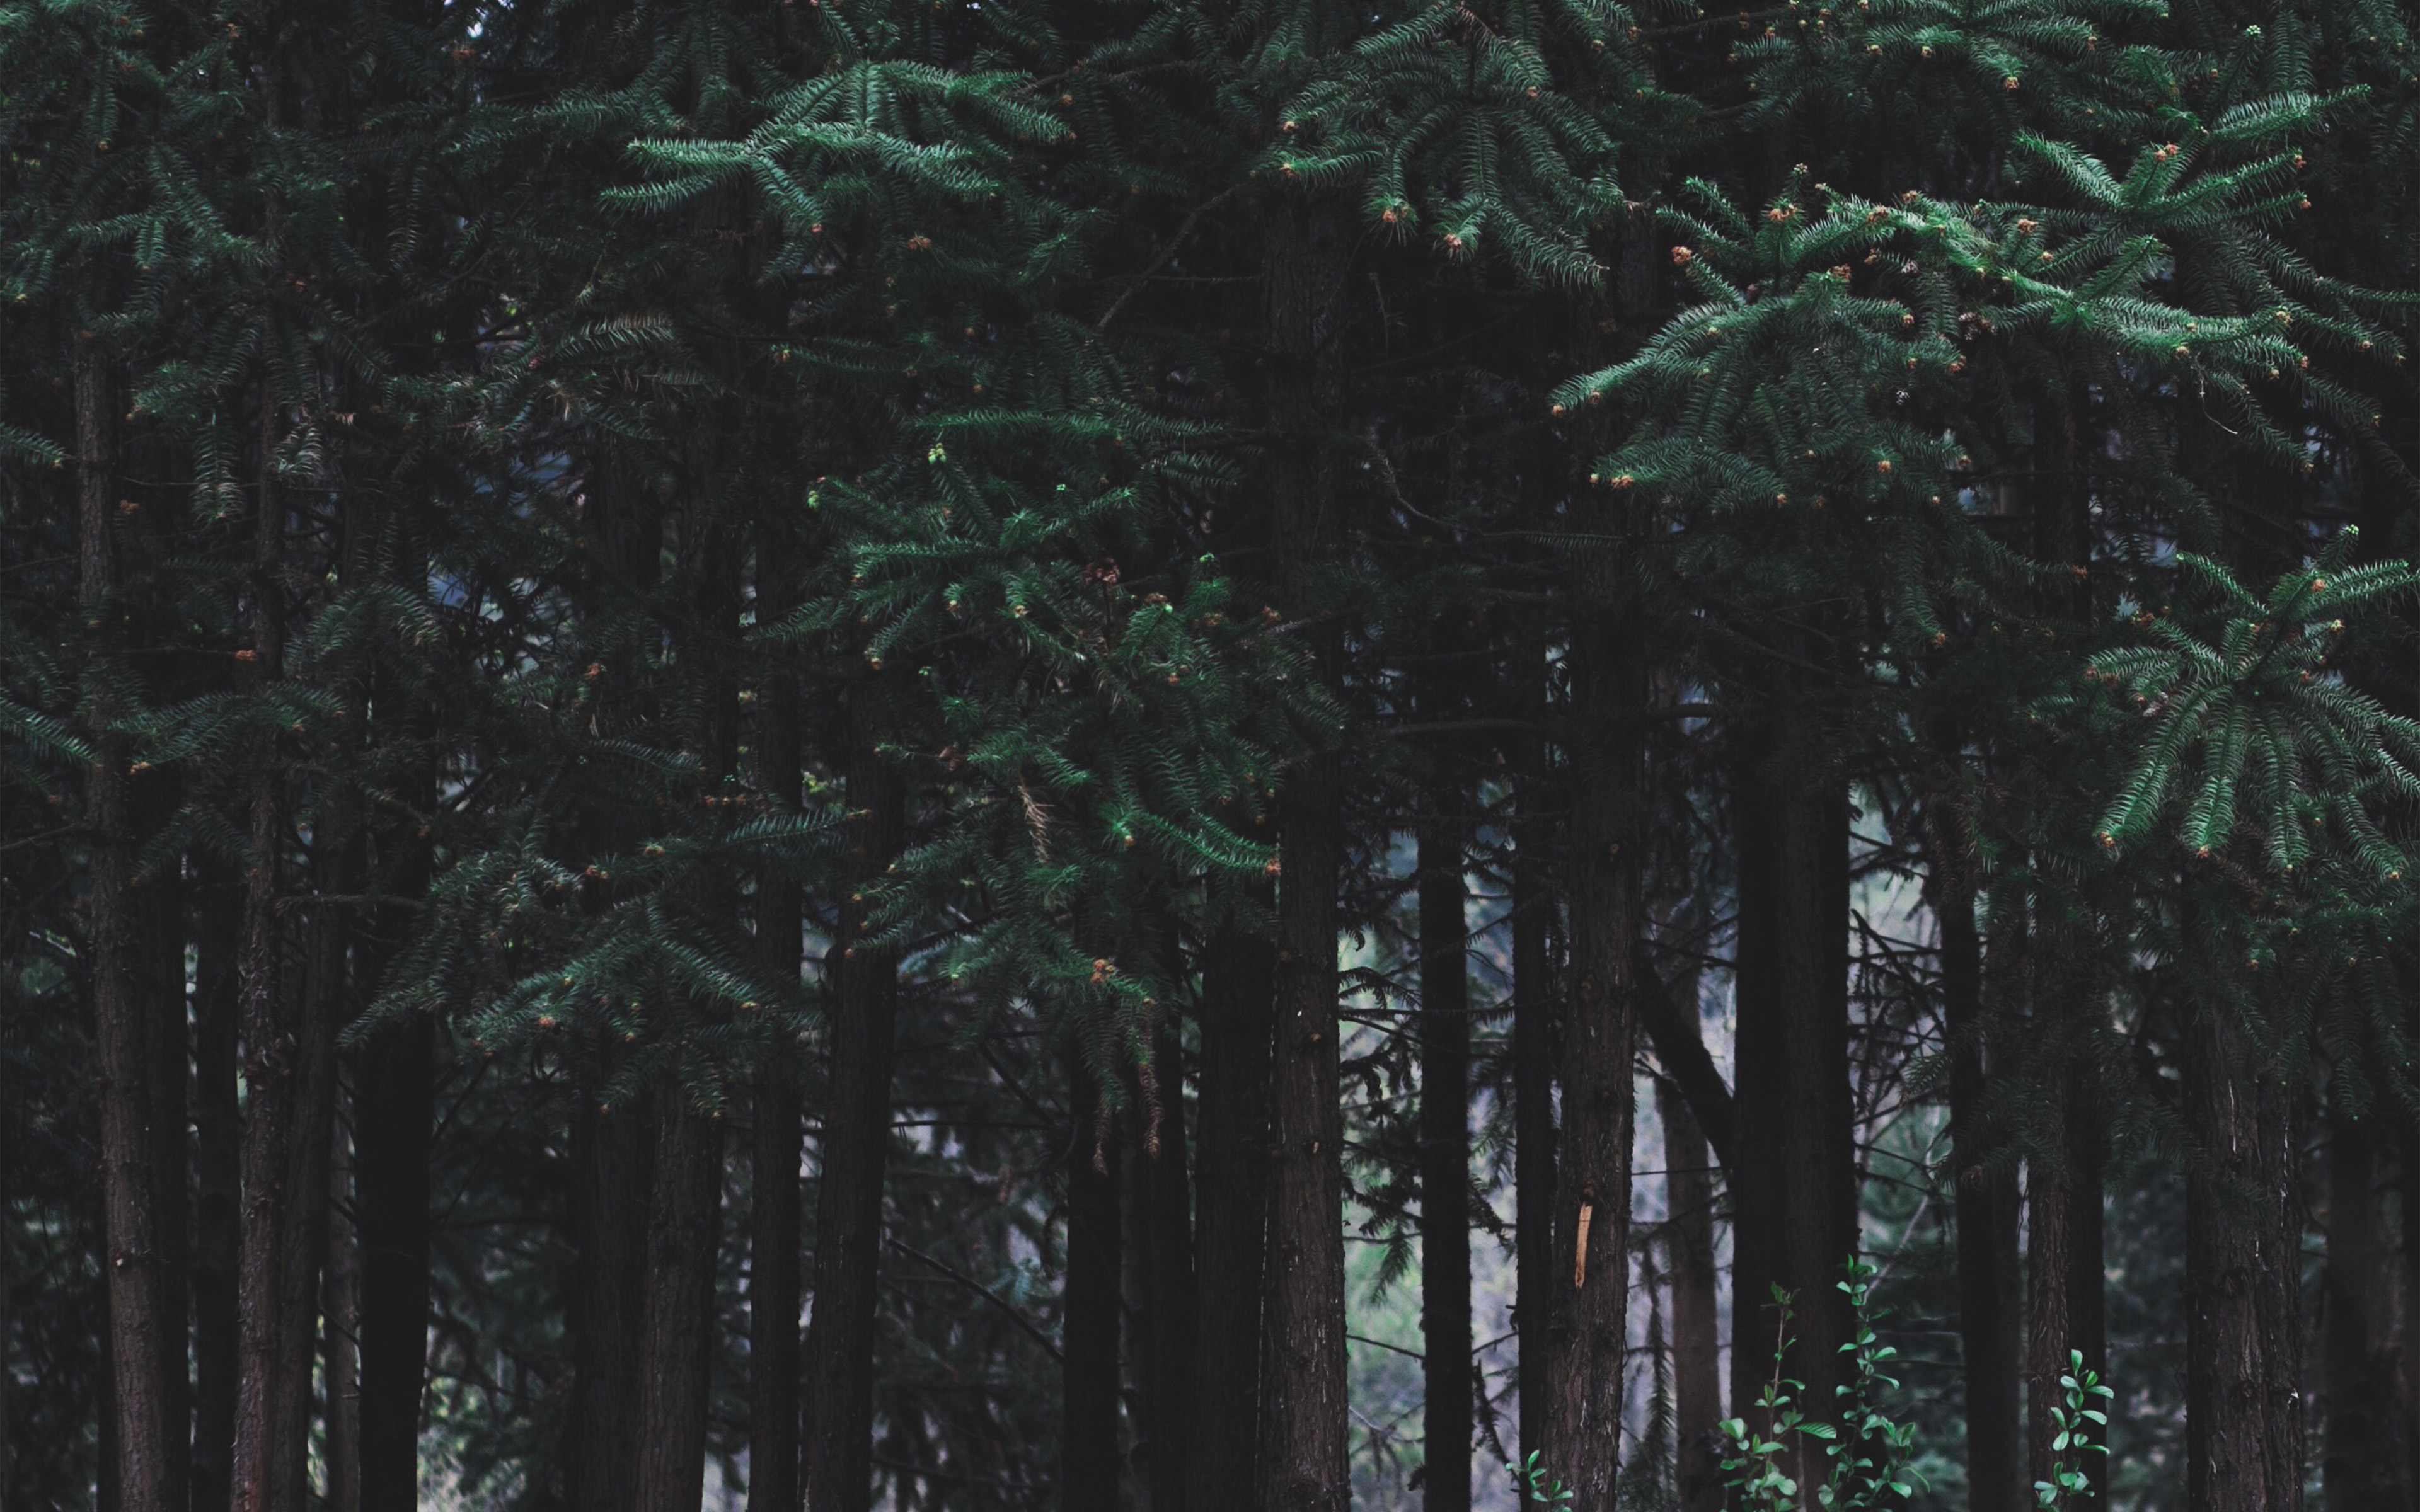 Wallpaper For Desktop Laptop Nh97 Wood Forest Dark Night Tree Nature